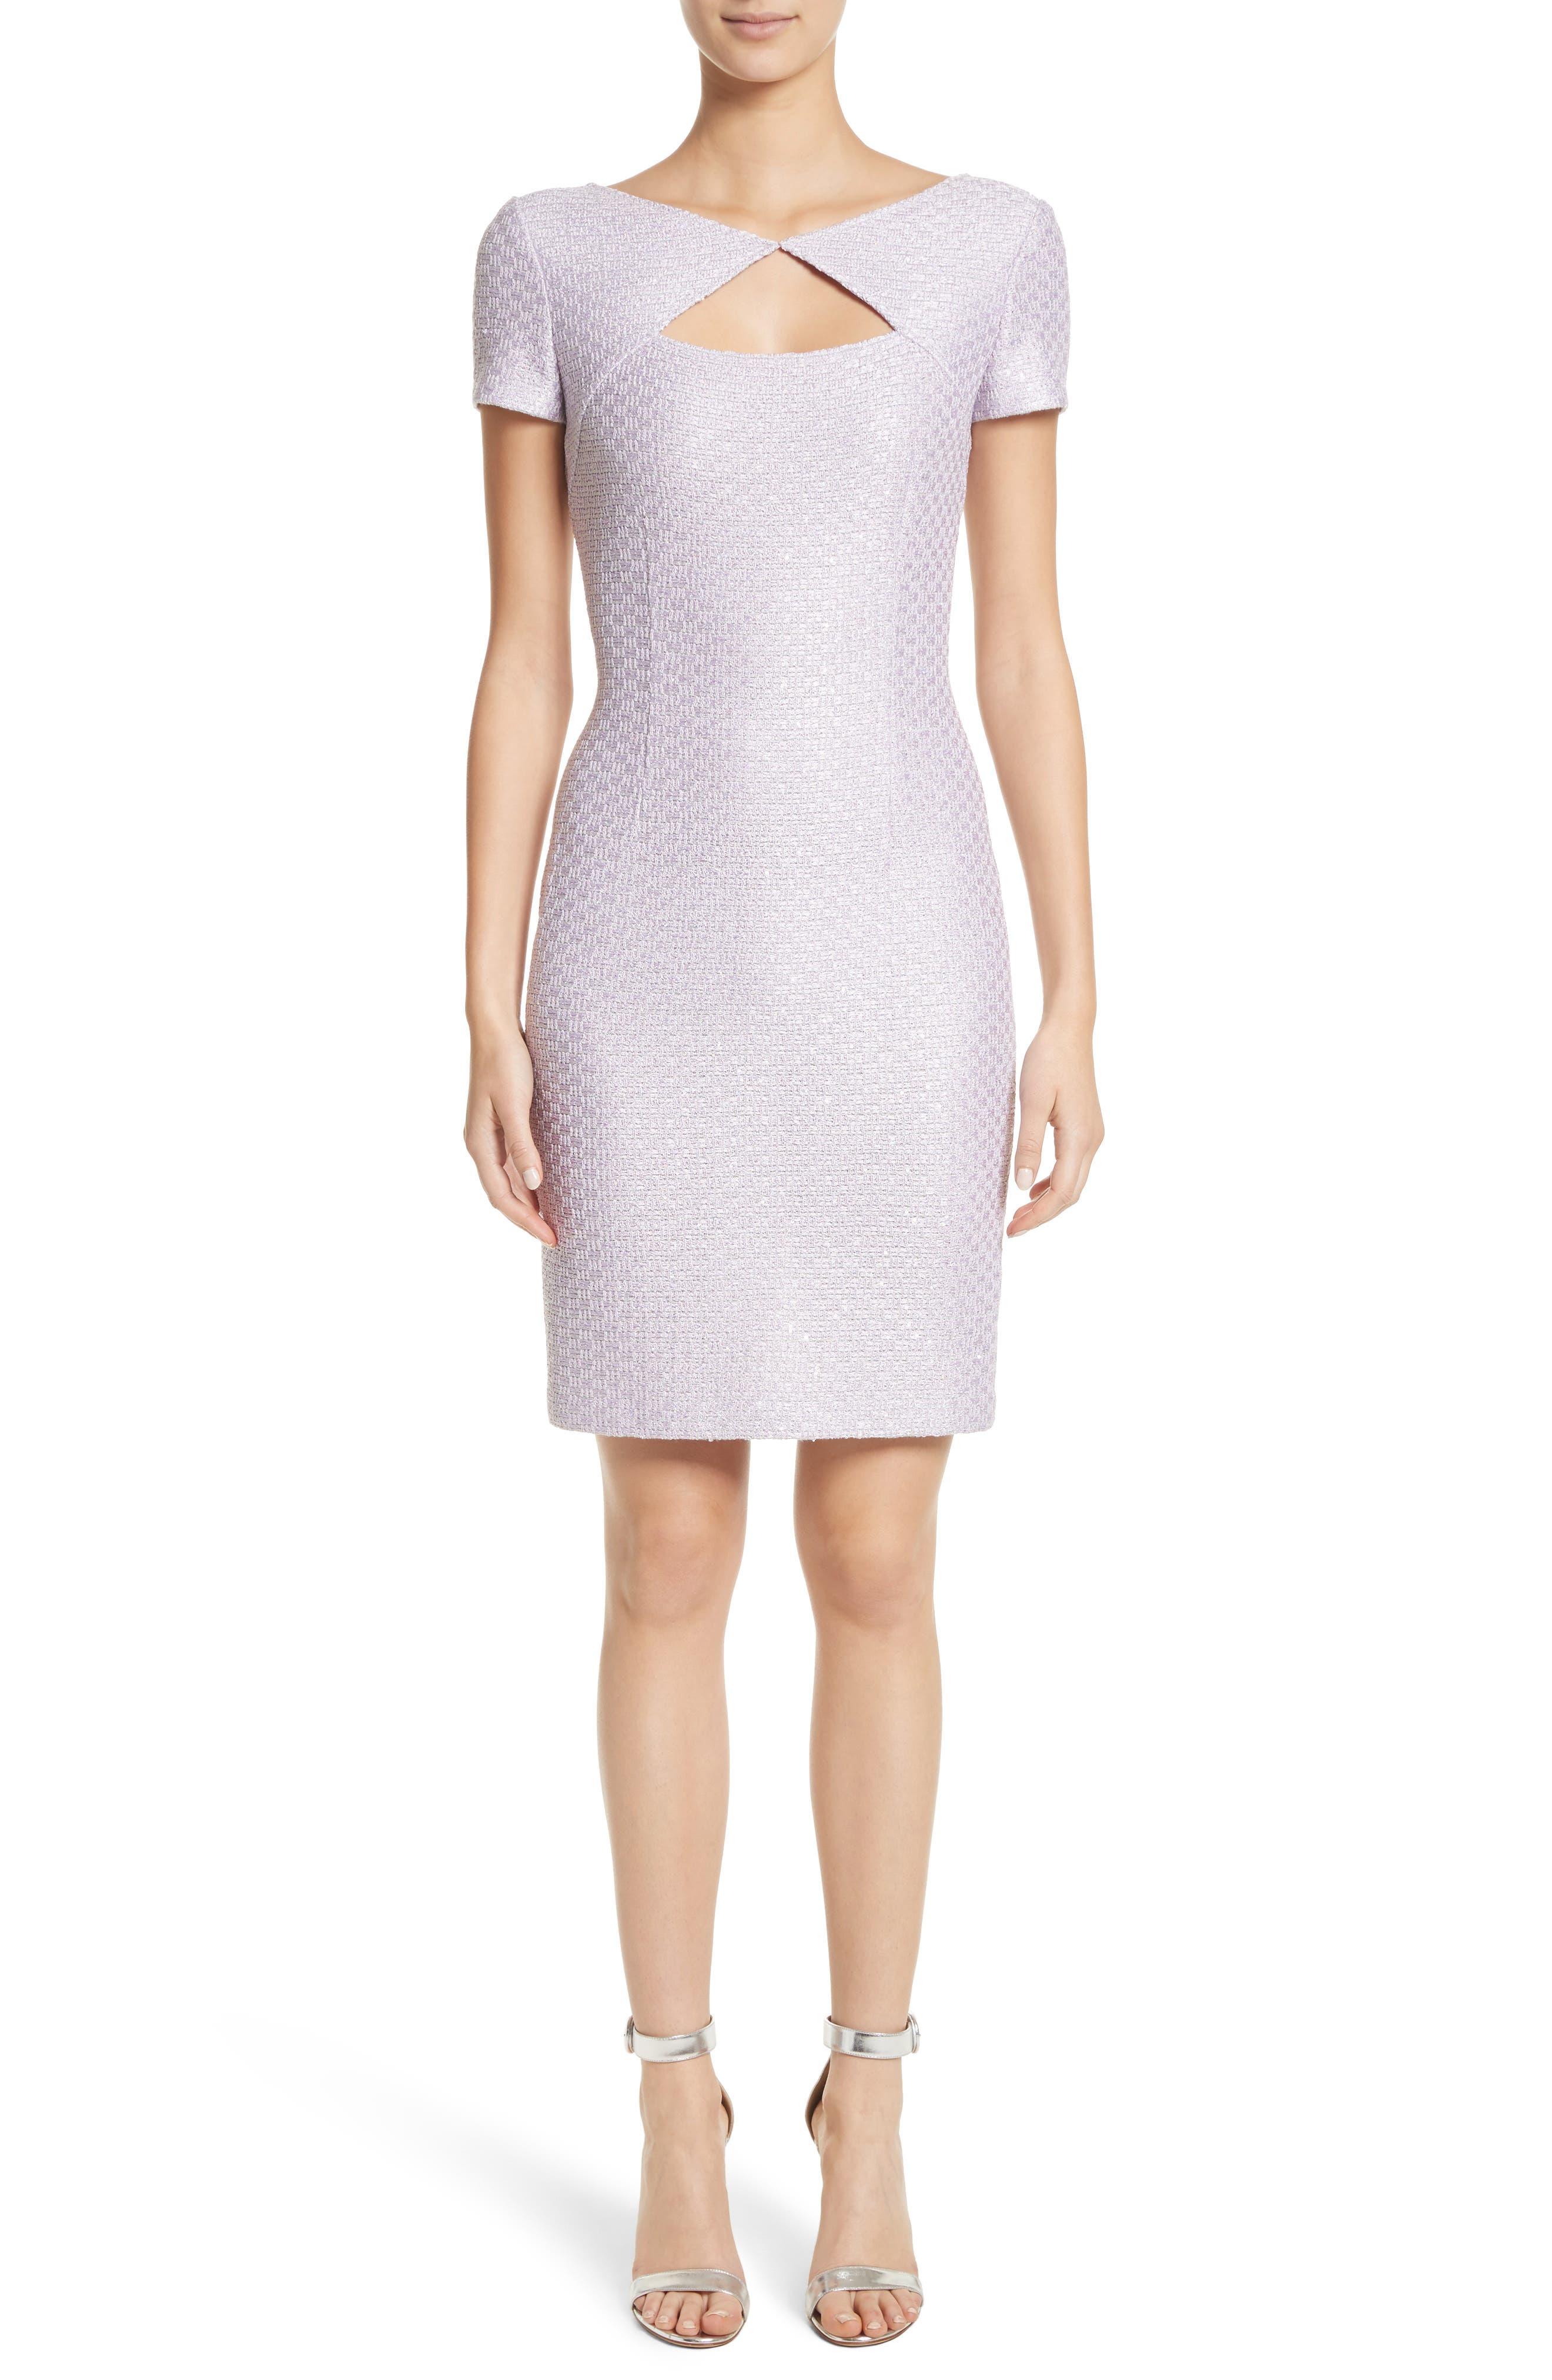 Hansh Sequin Knit Cutout Dress,                             Main thumbnail 1, color,                             Lilac Multi